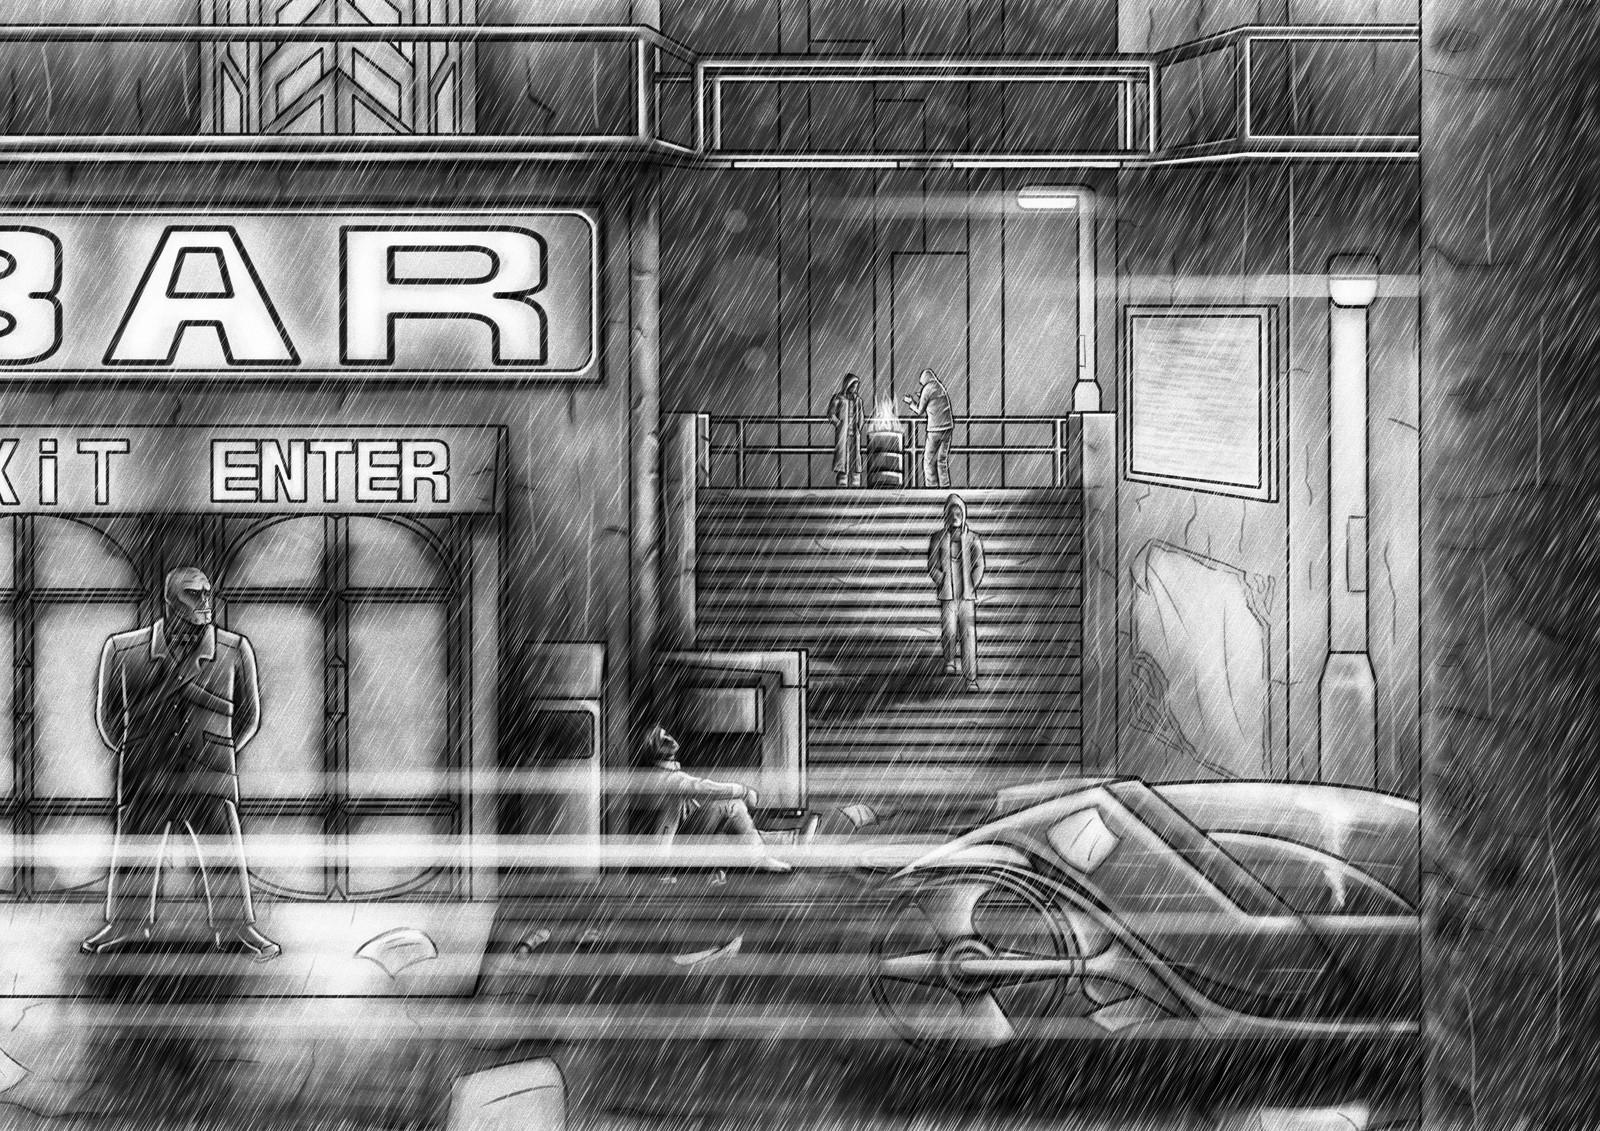 03: Rain and Light Streaks